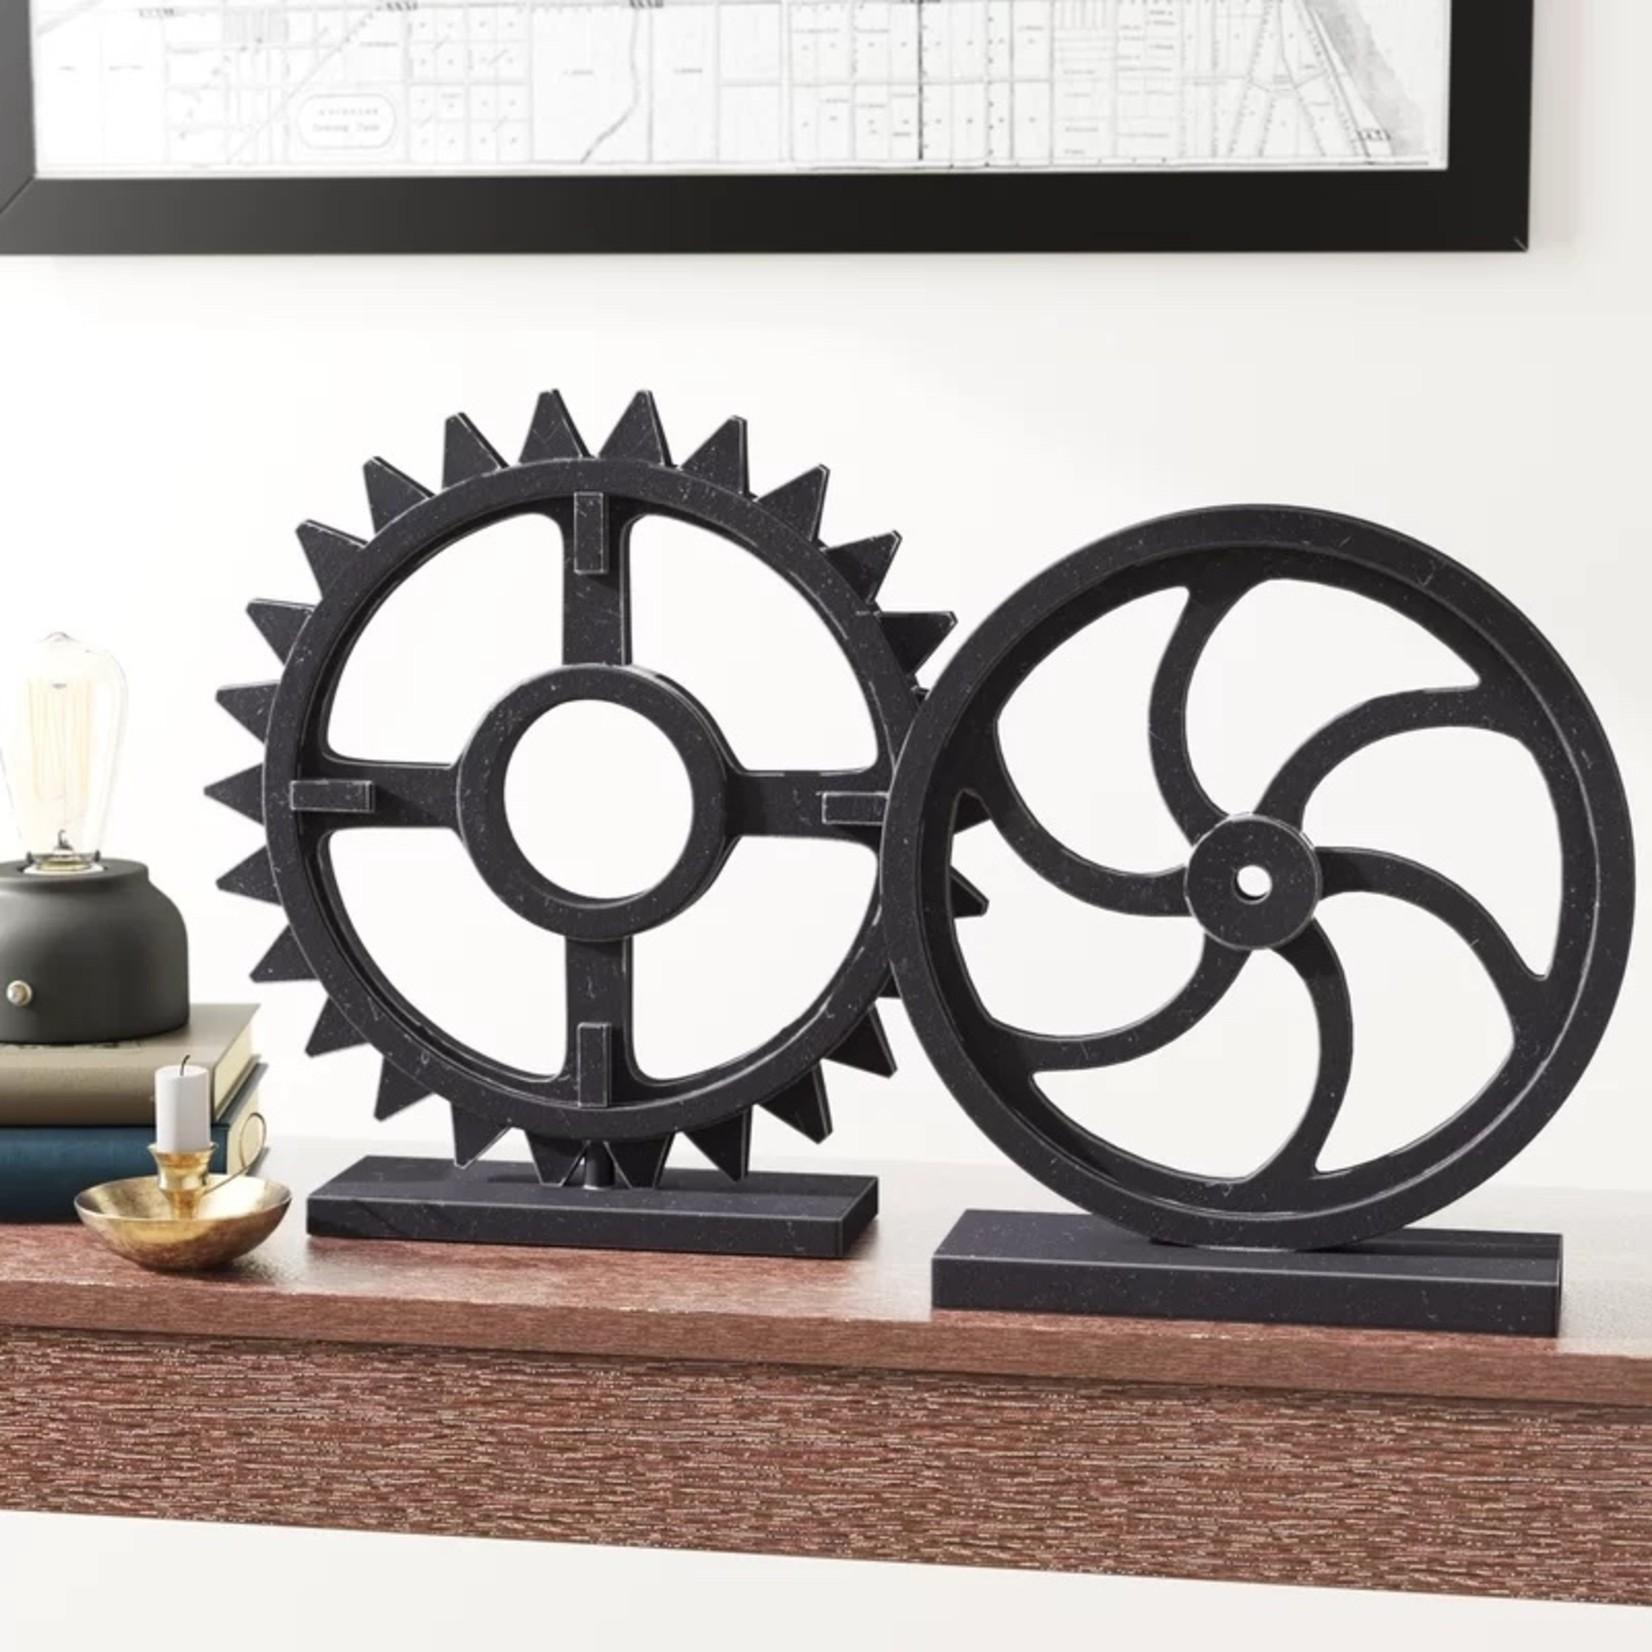 *2 Piece Sculpture Set - Set of 2 - Black